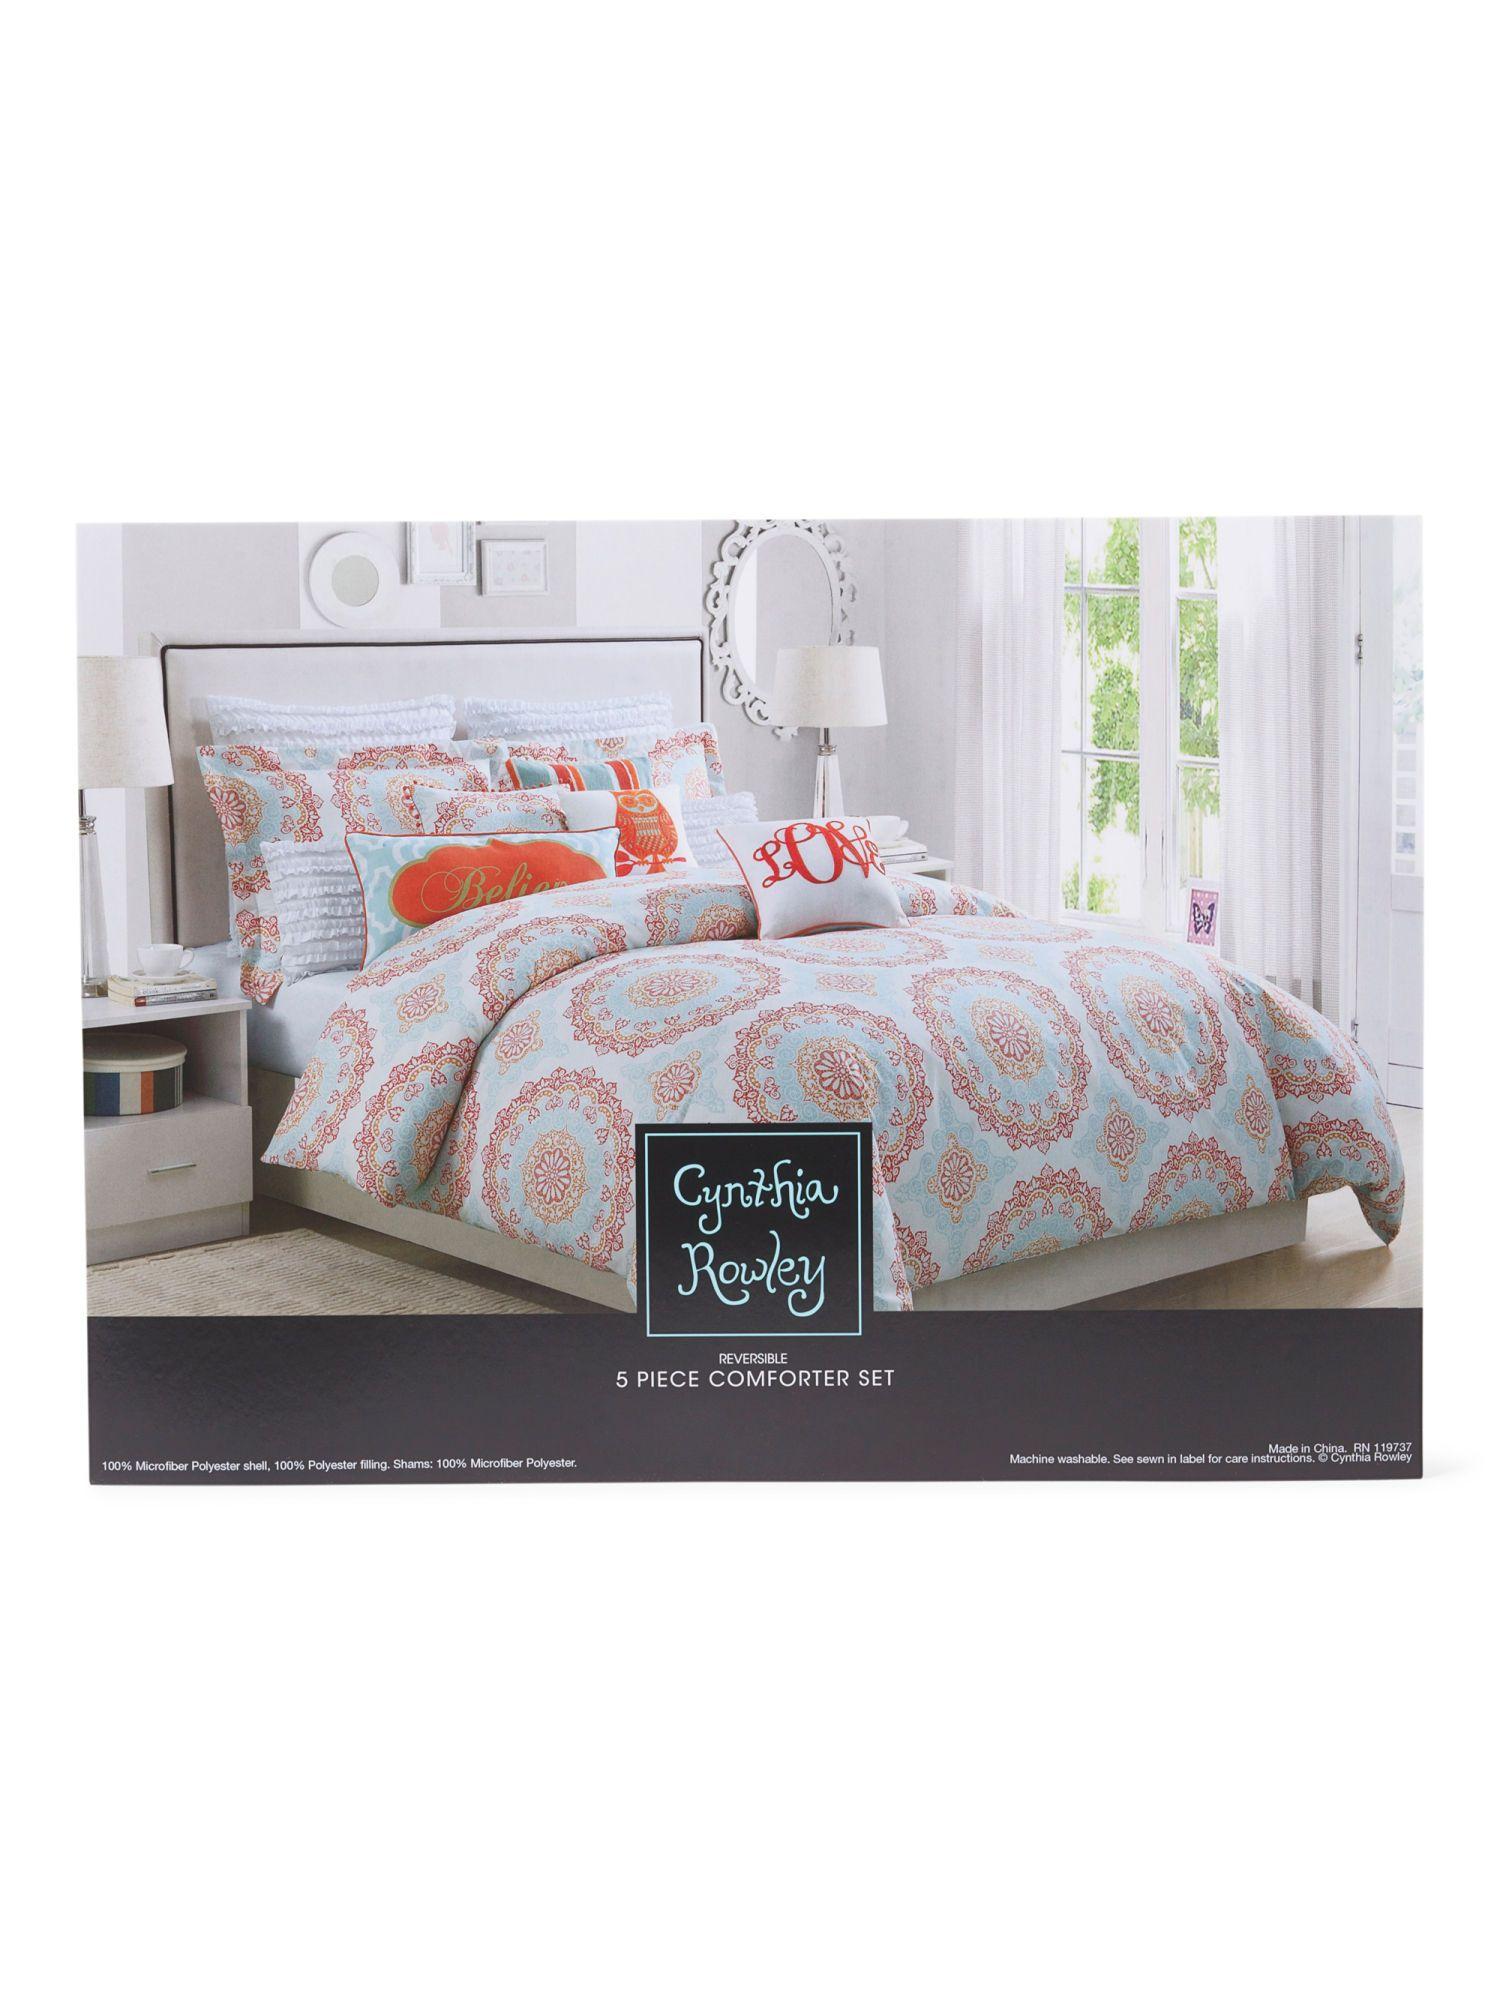 Lee Comforter Set With Pillows Comforter sets, Duvet